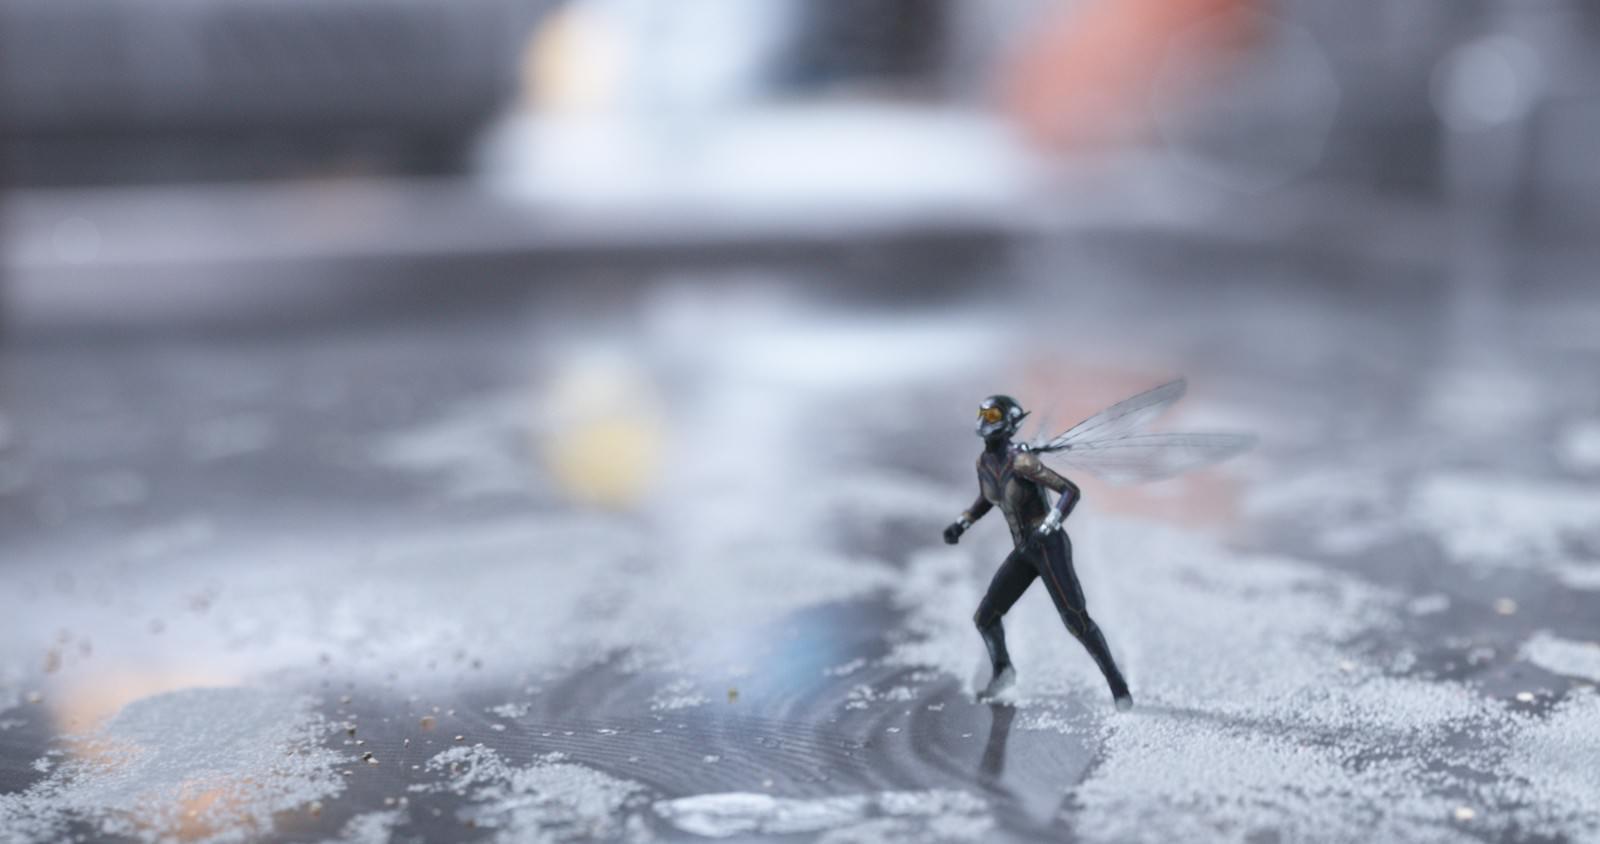 Movie, Ant-Man and the Wasp(美國.英國) / 蟻人與黃蜂女(台) / 蚁人2:黄蜂女现身(中) / 蟻俠2:黃蜂女現身(港), 電影劇照